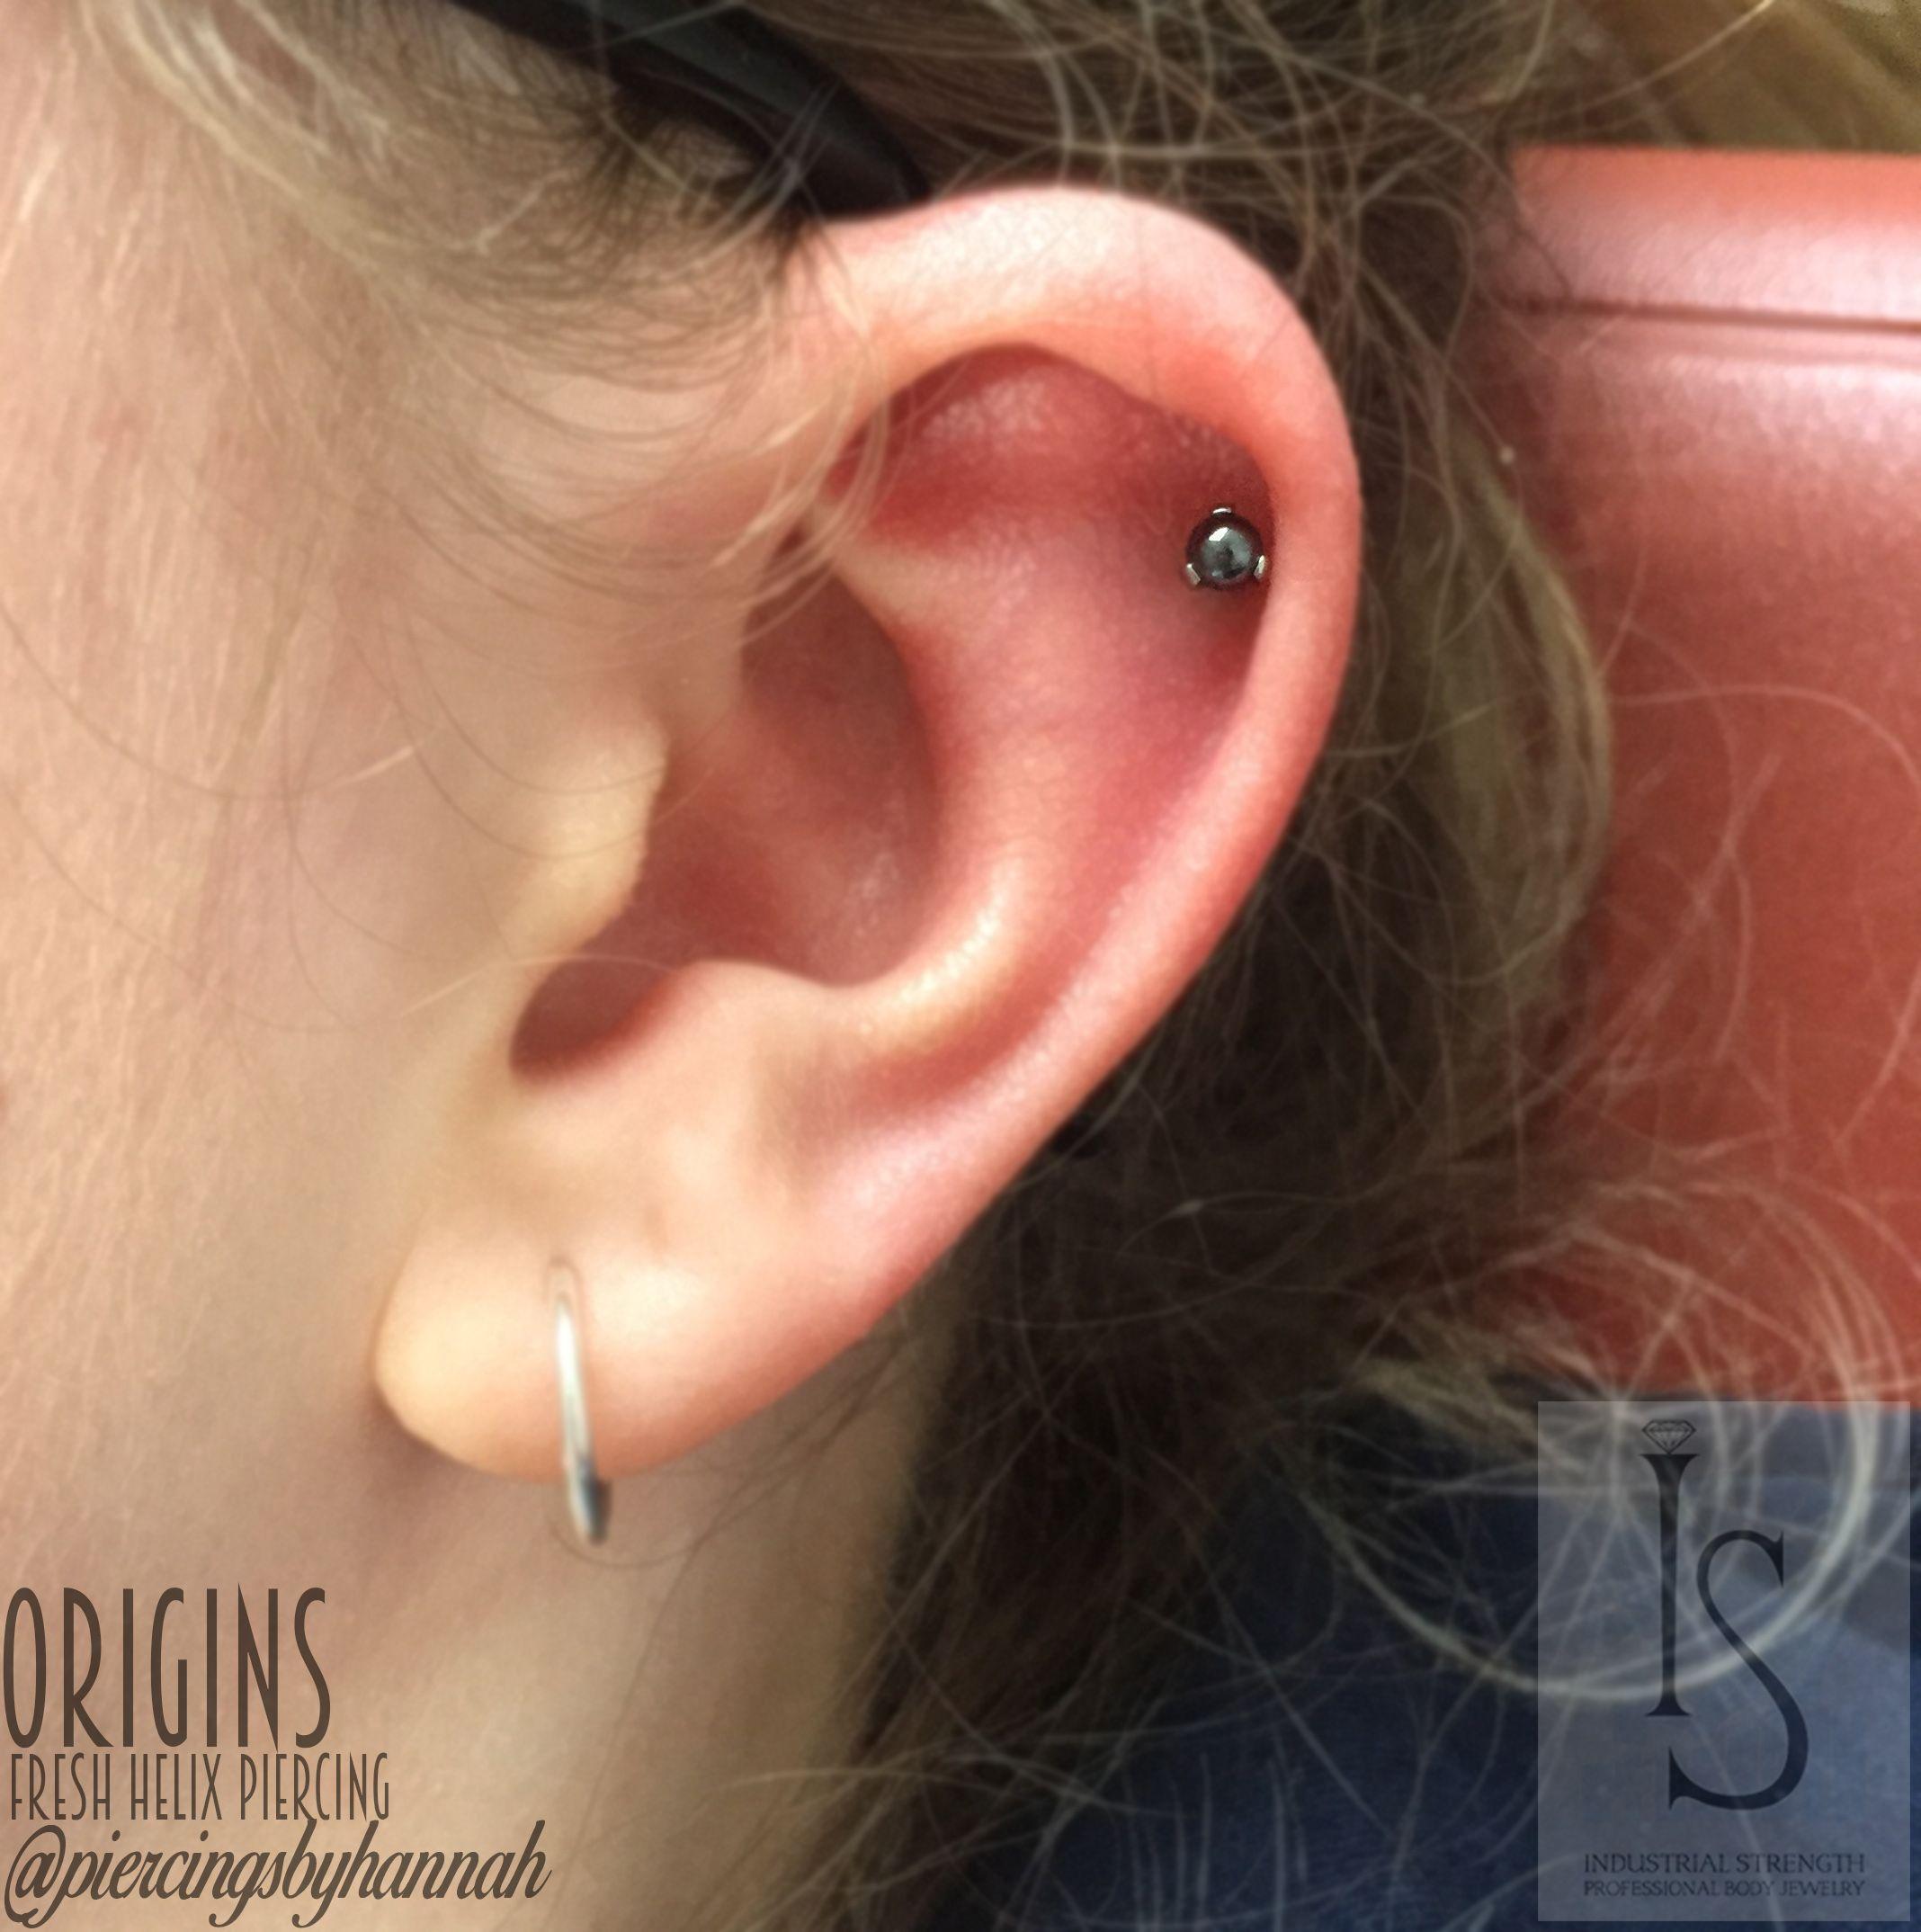 Nose piercing gun vs needle  Fresh helix piercing Pierced by piercingsbyhannah Studio Origin